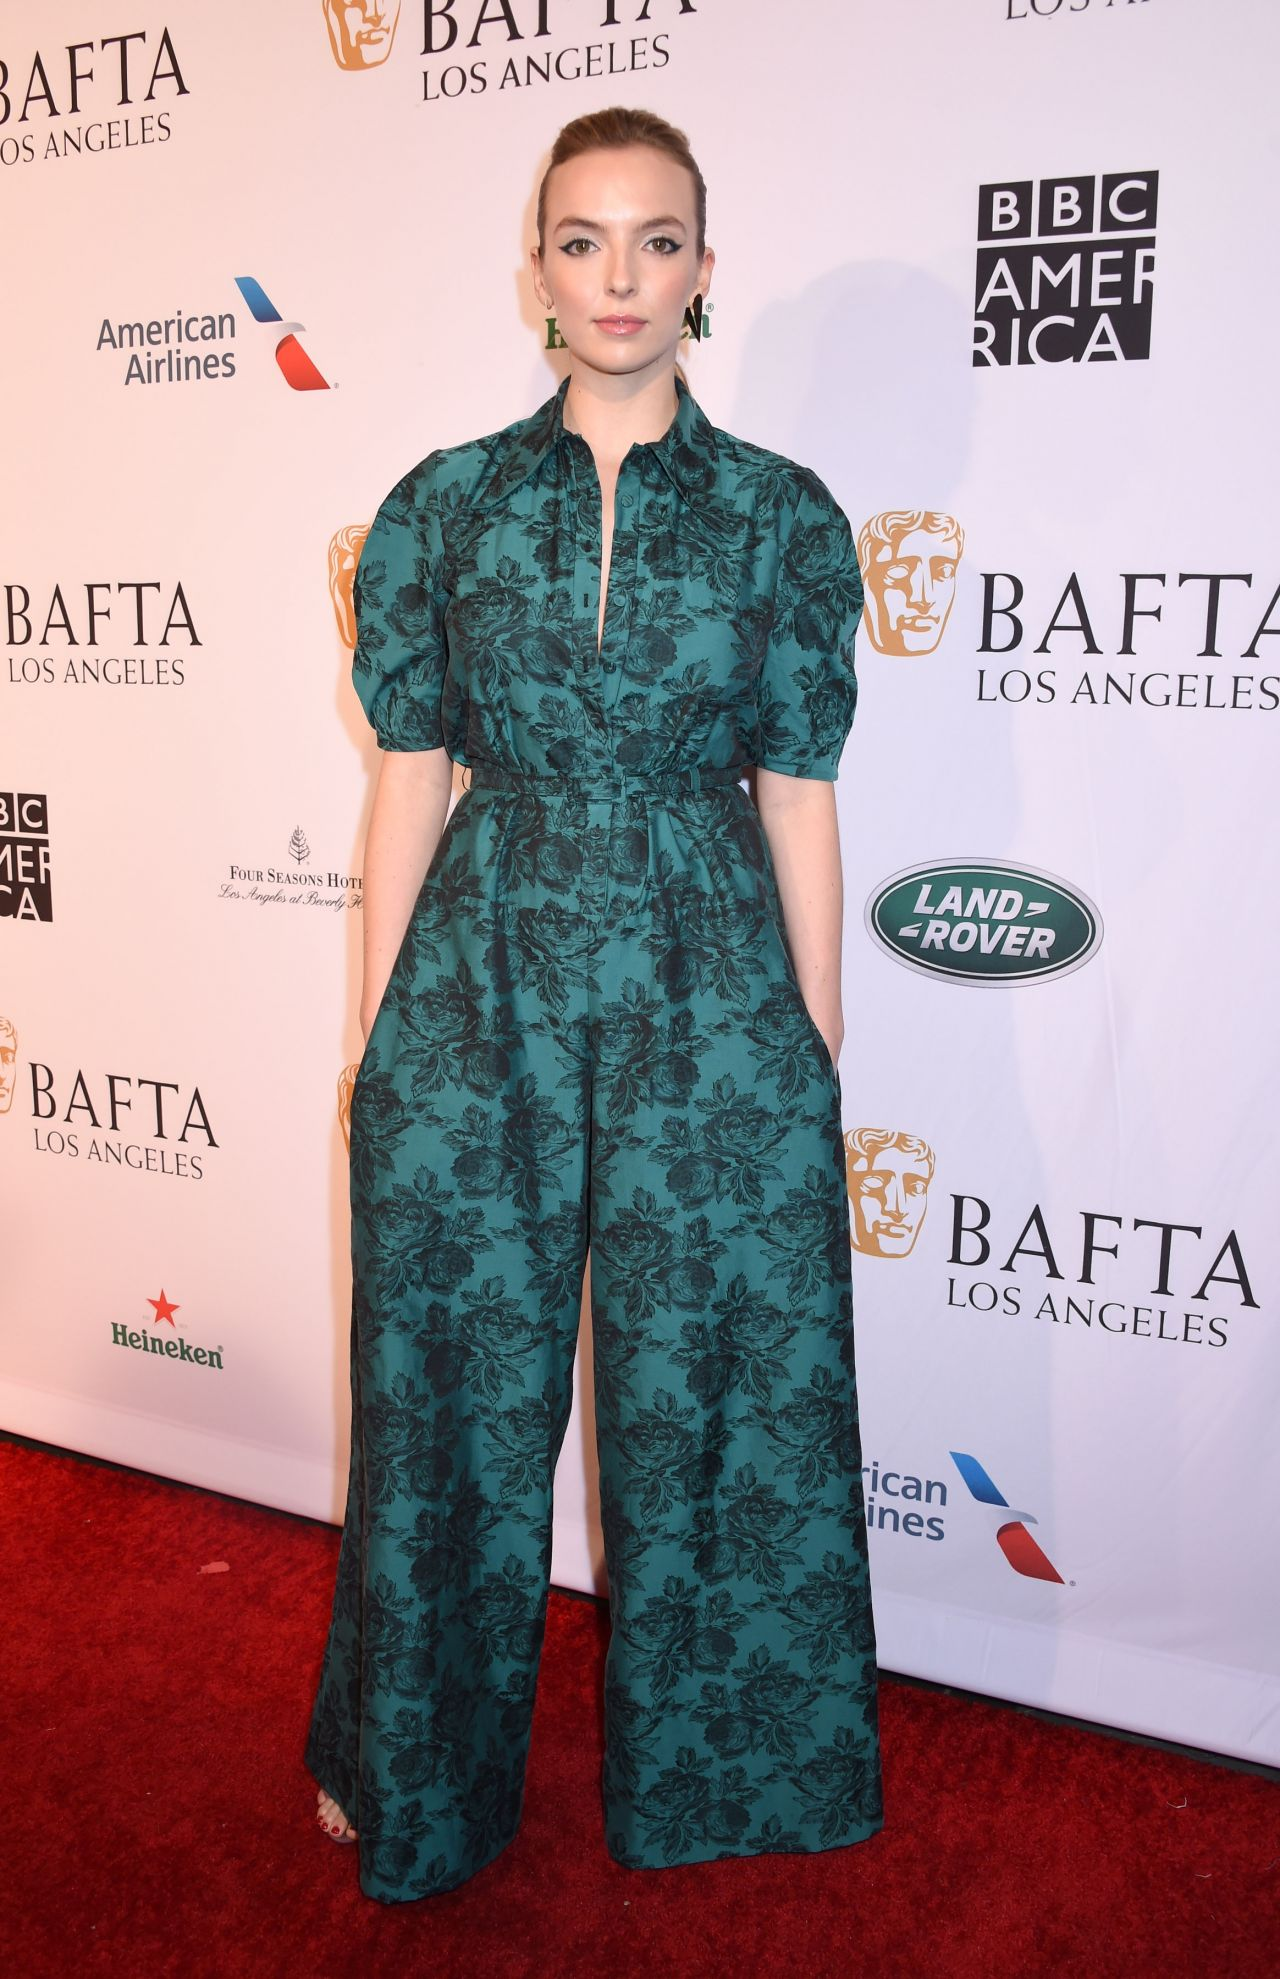 bafta awards 2019 - photo #42